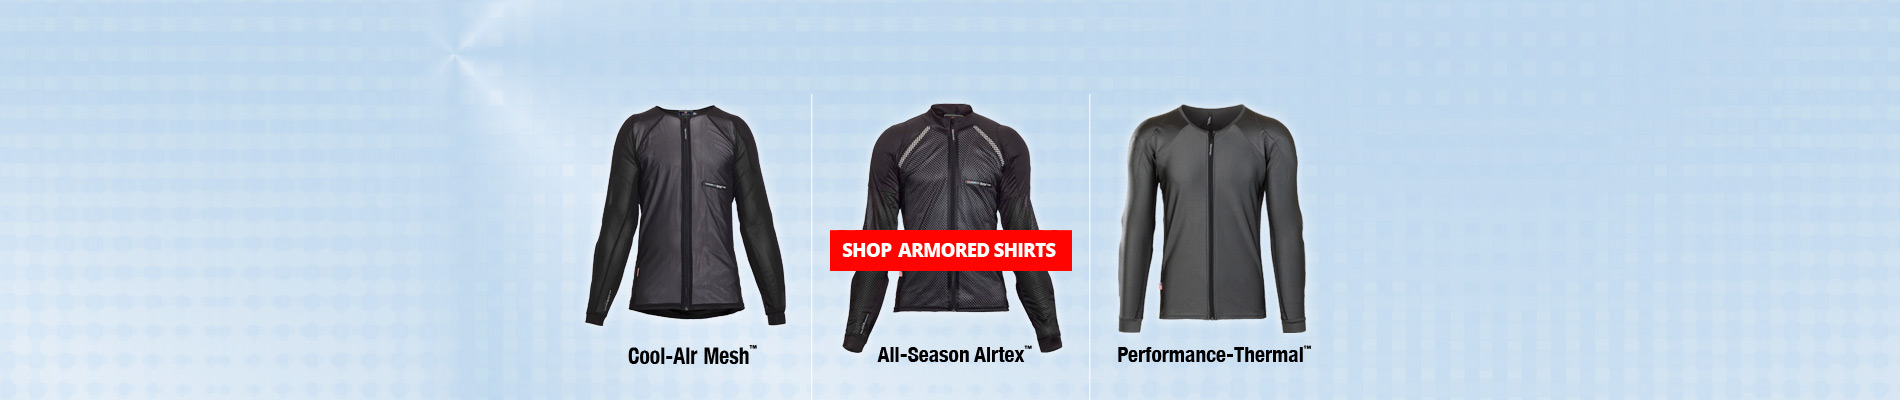 Shirt sale slider graphic